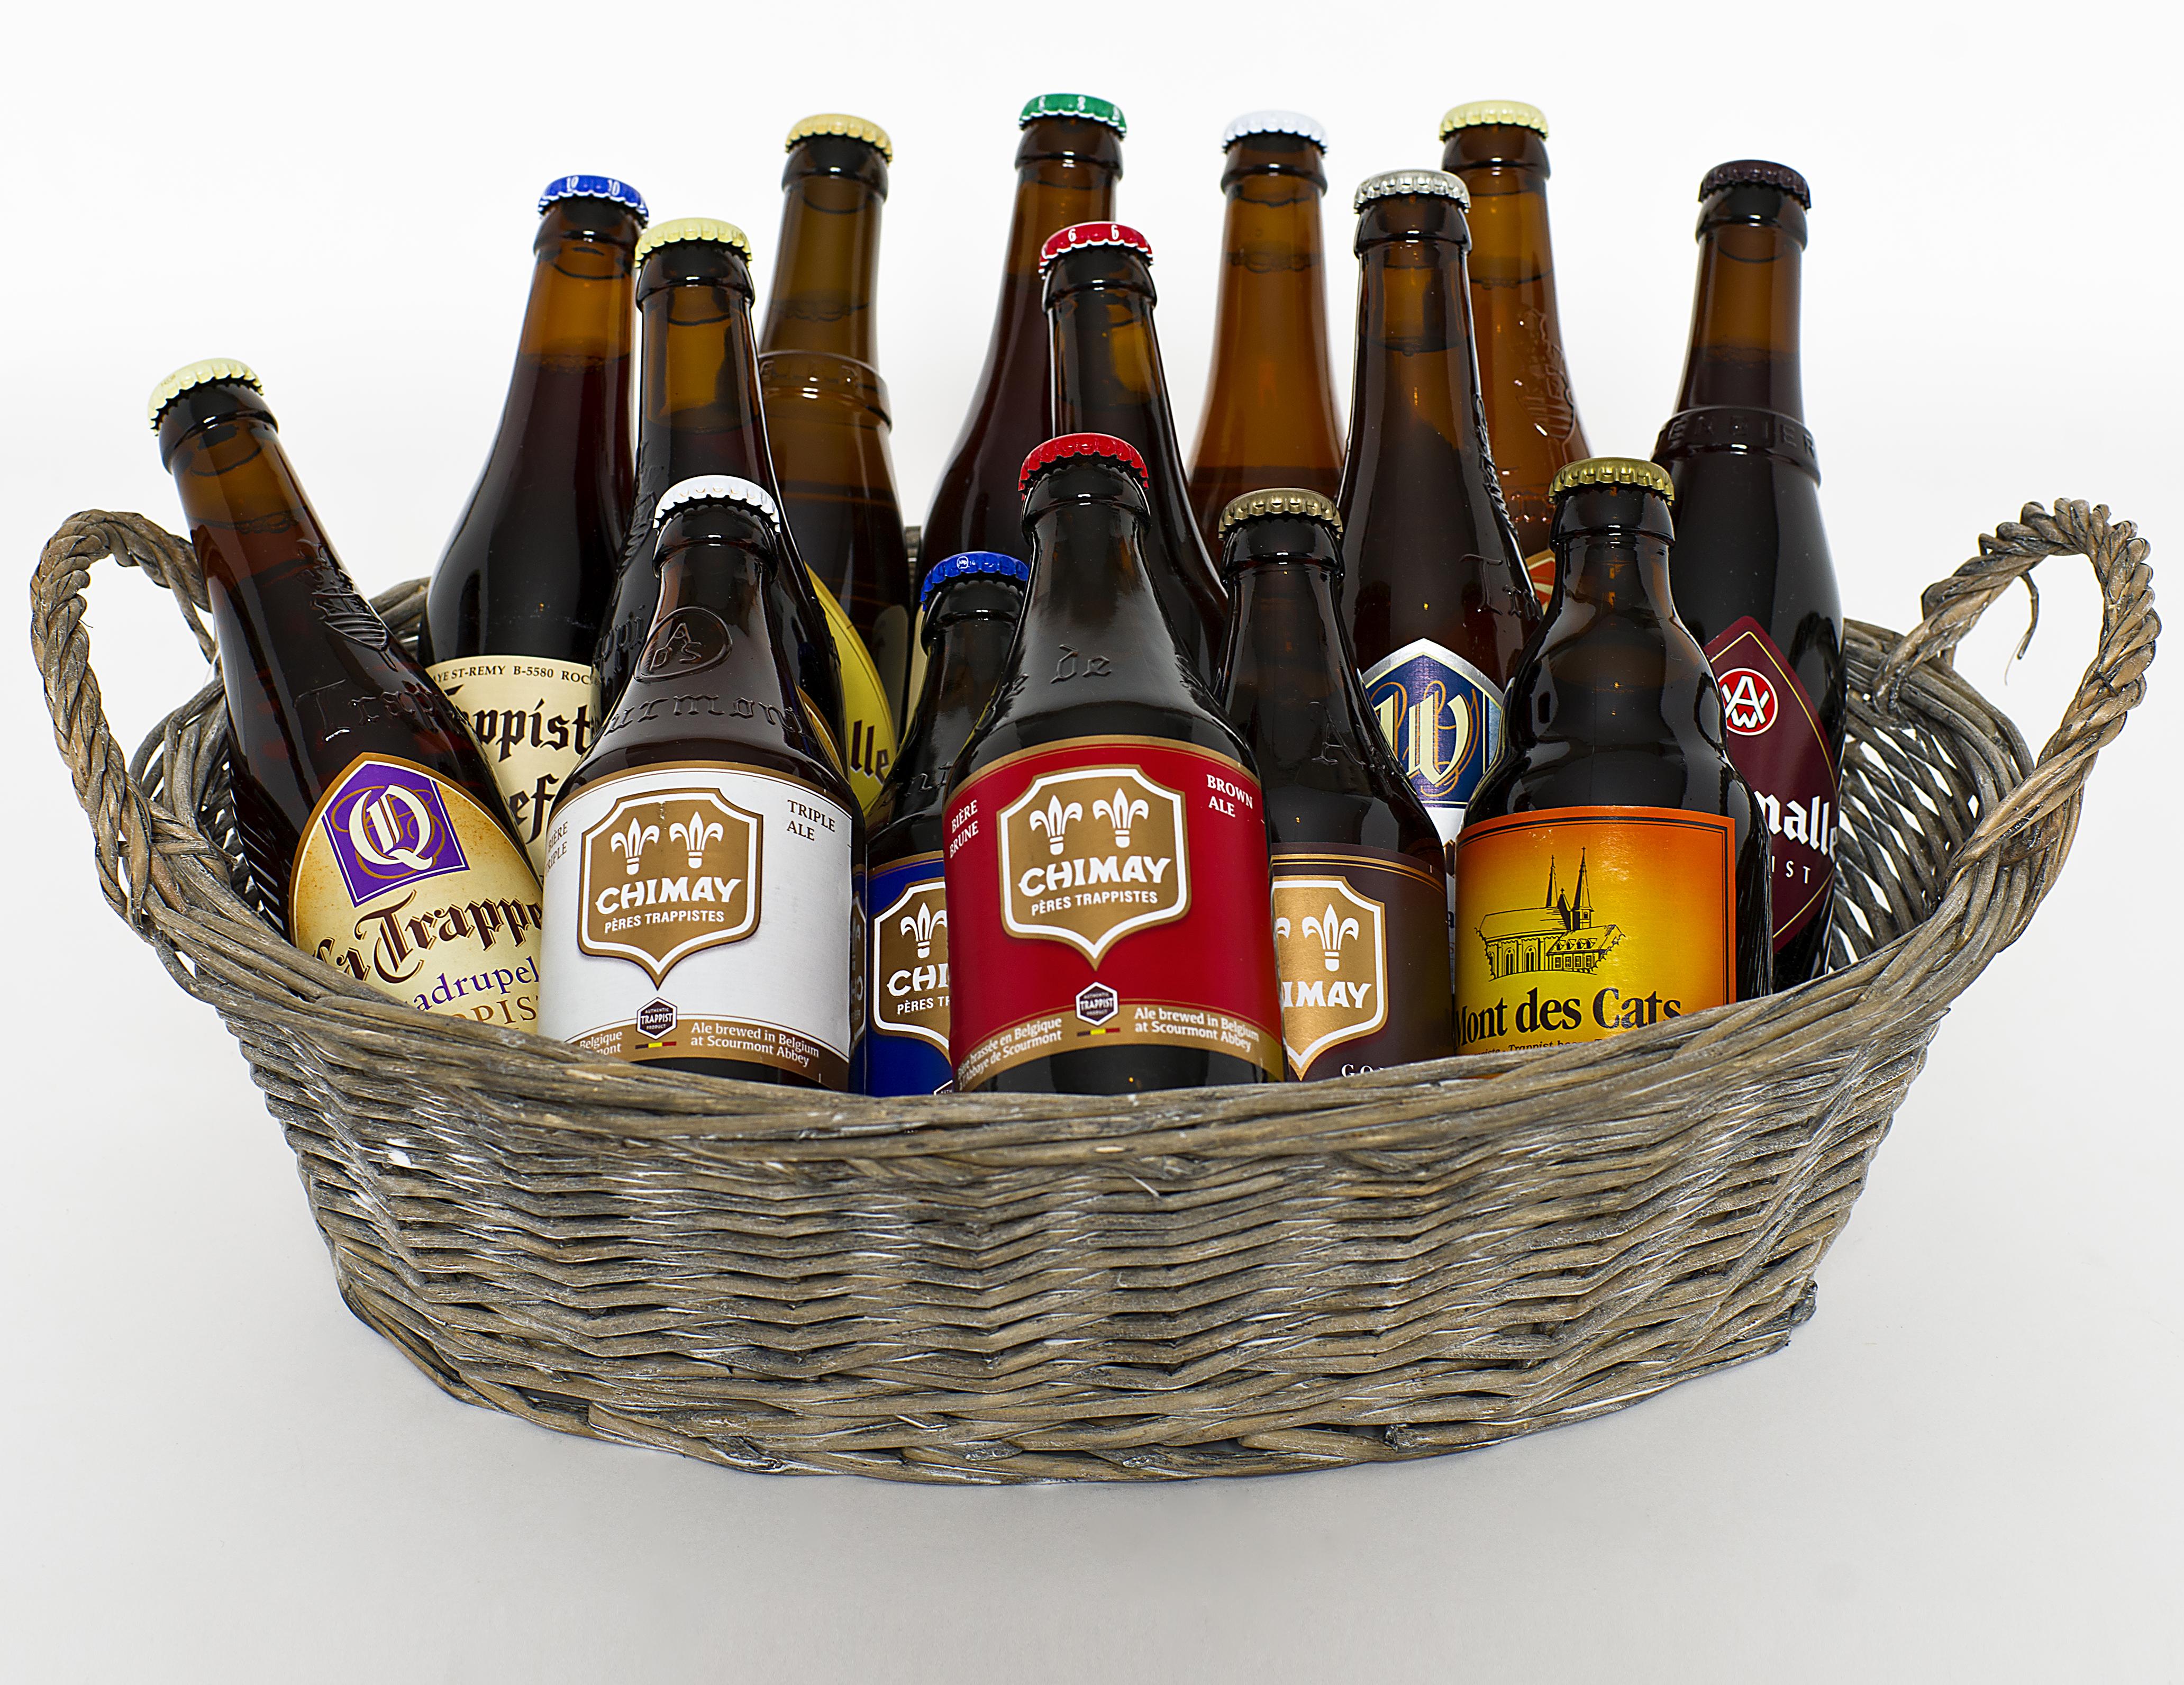 Esta Navidad ¡Regala cerveza!: Cesta 'Best Trappist'